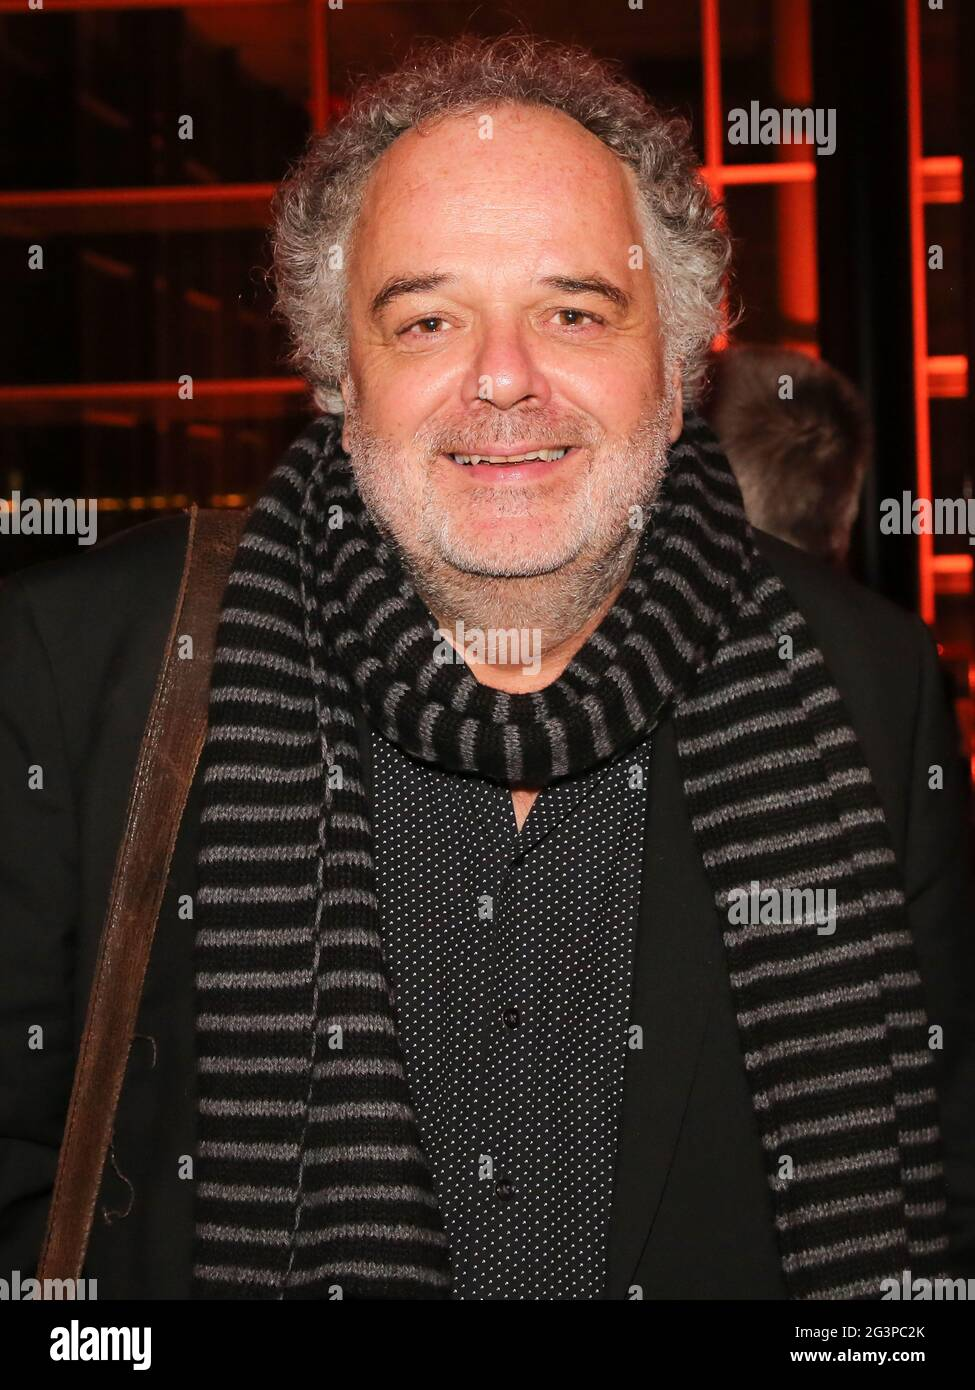 Peter Dreckmann MDR Leiter Entertainment bei der 25. José Carreras Gala am 12. Dezember 2019 Leipzig Stockfoto